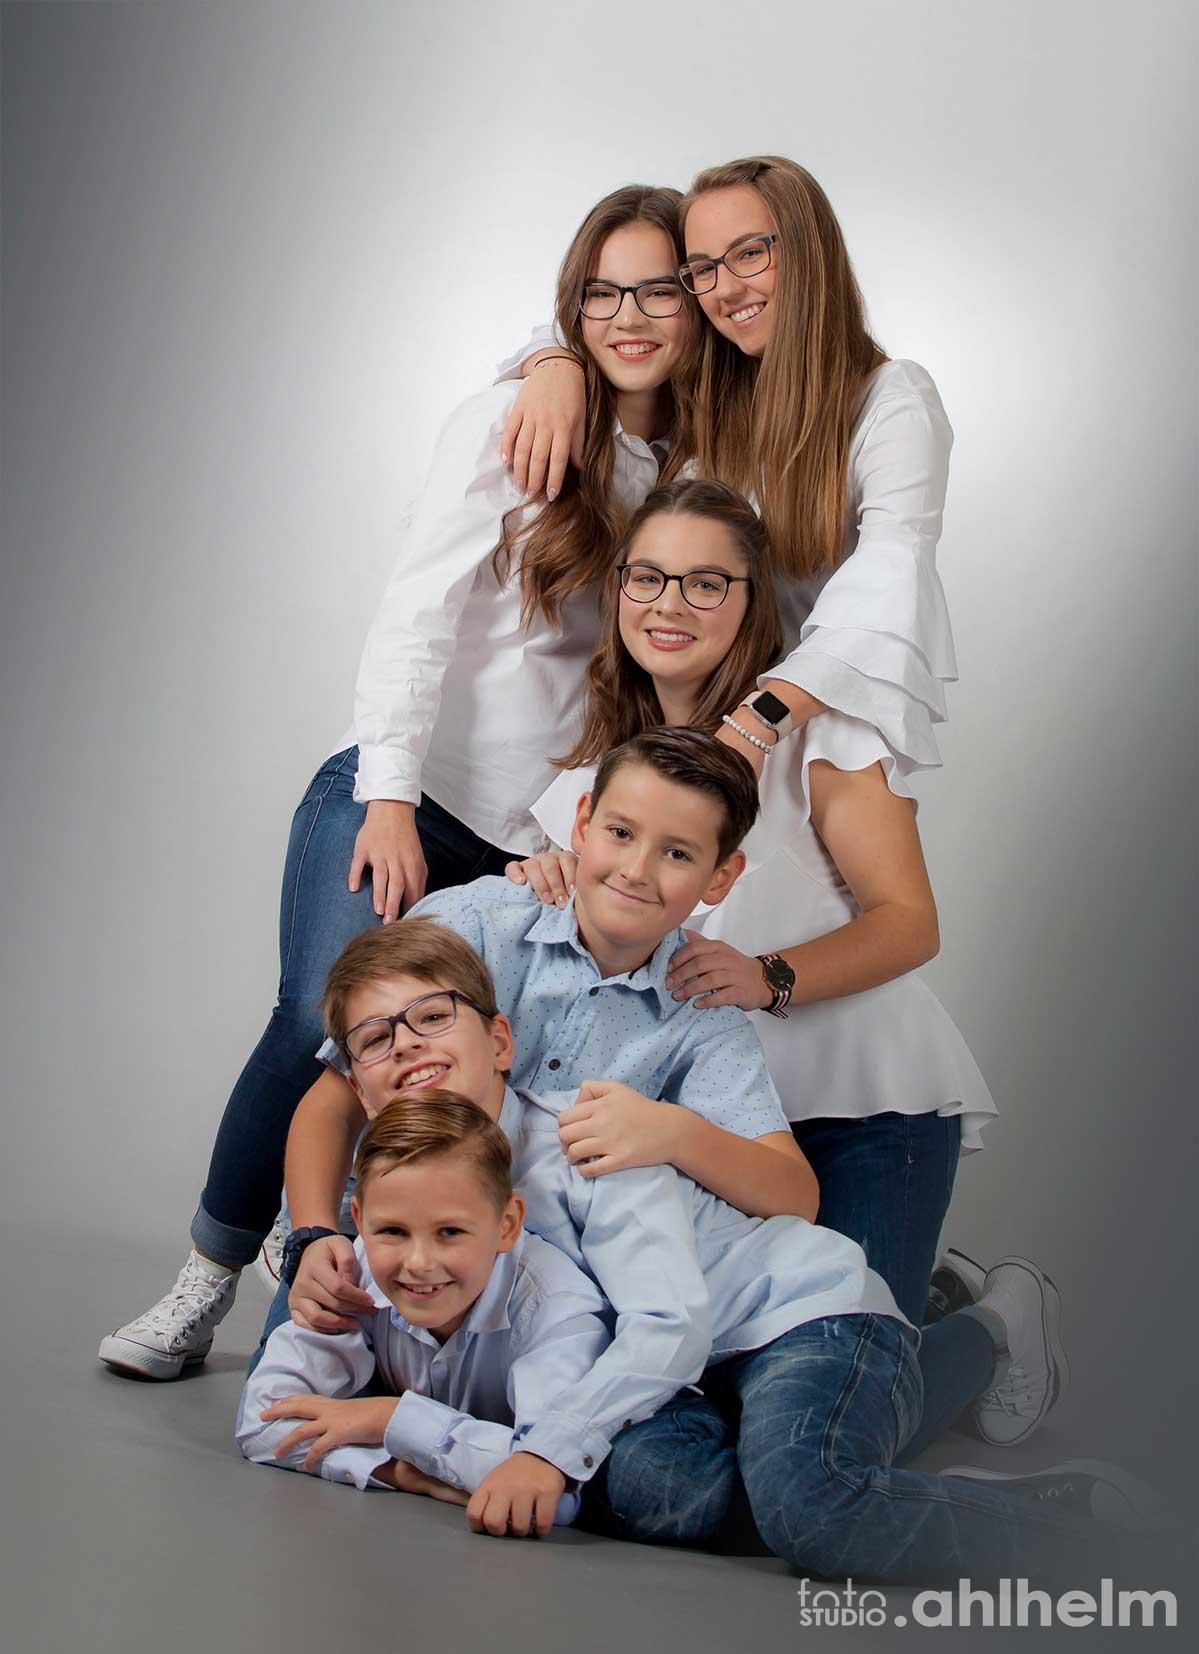 Fotostudio Ahlhelm Familie Studio alle zusammen